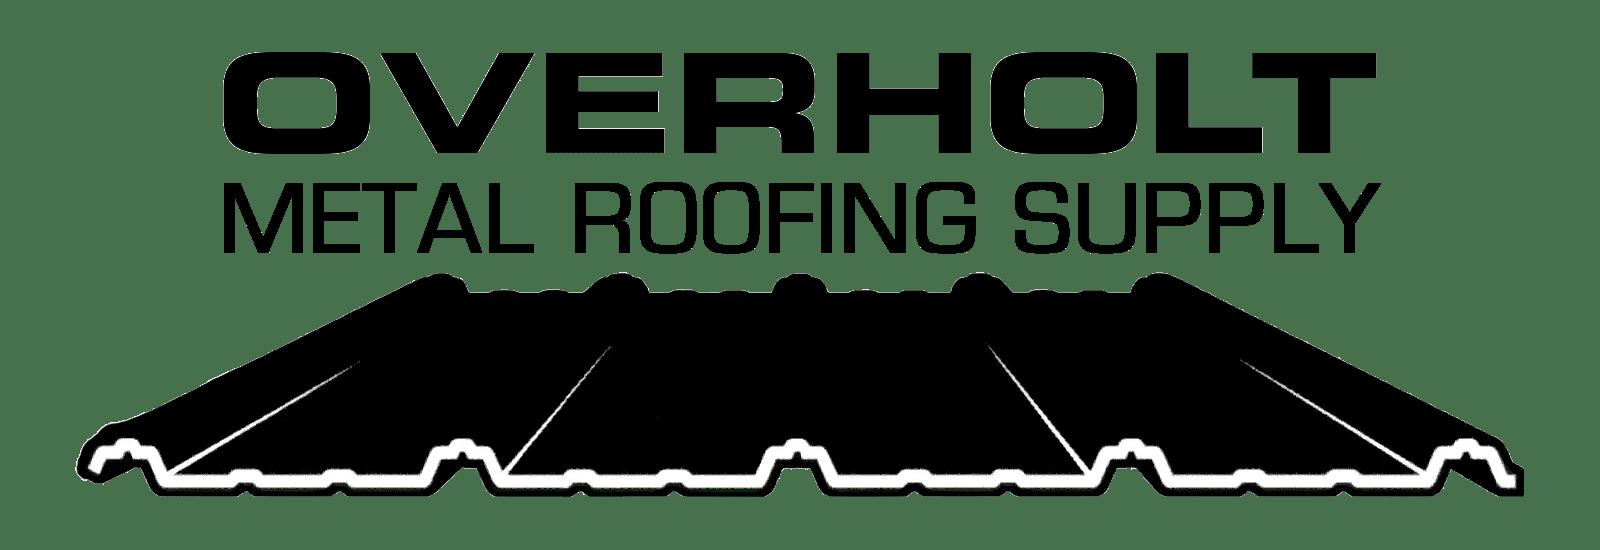 Overholt Metal Roofing Supply